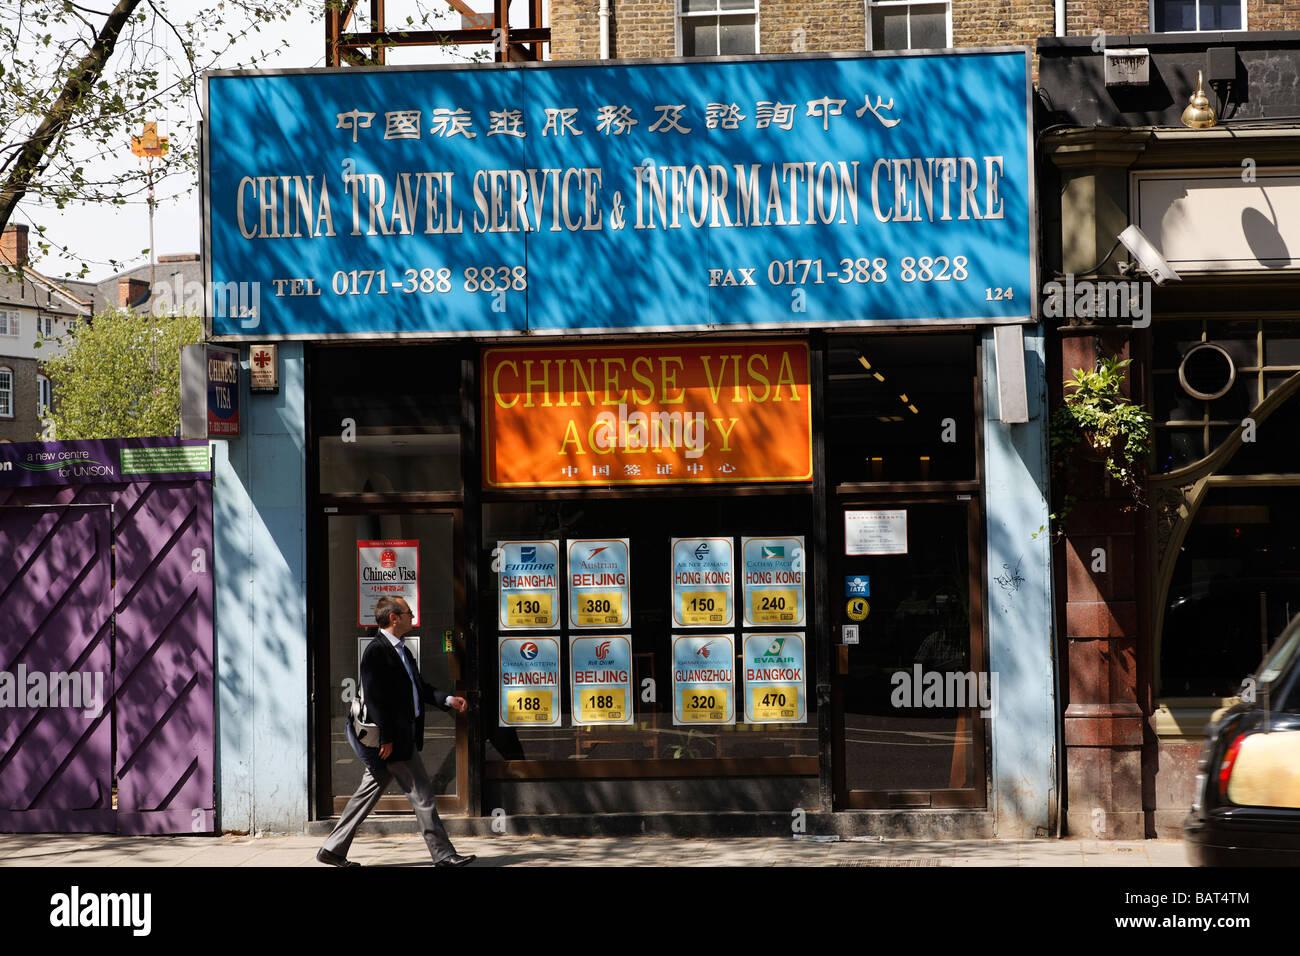 China Travel Service and Information Centre, Euston Road, London, England - Stock Image